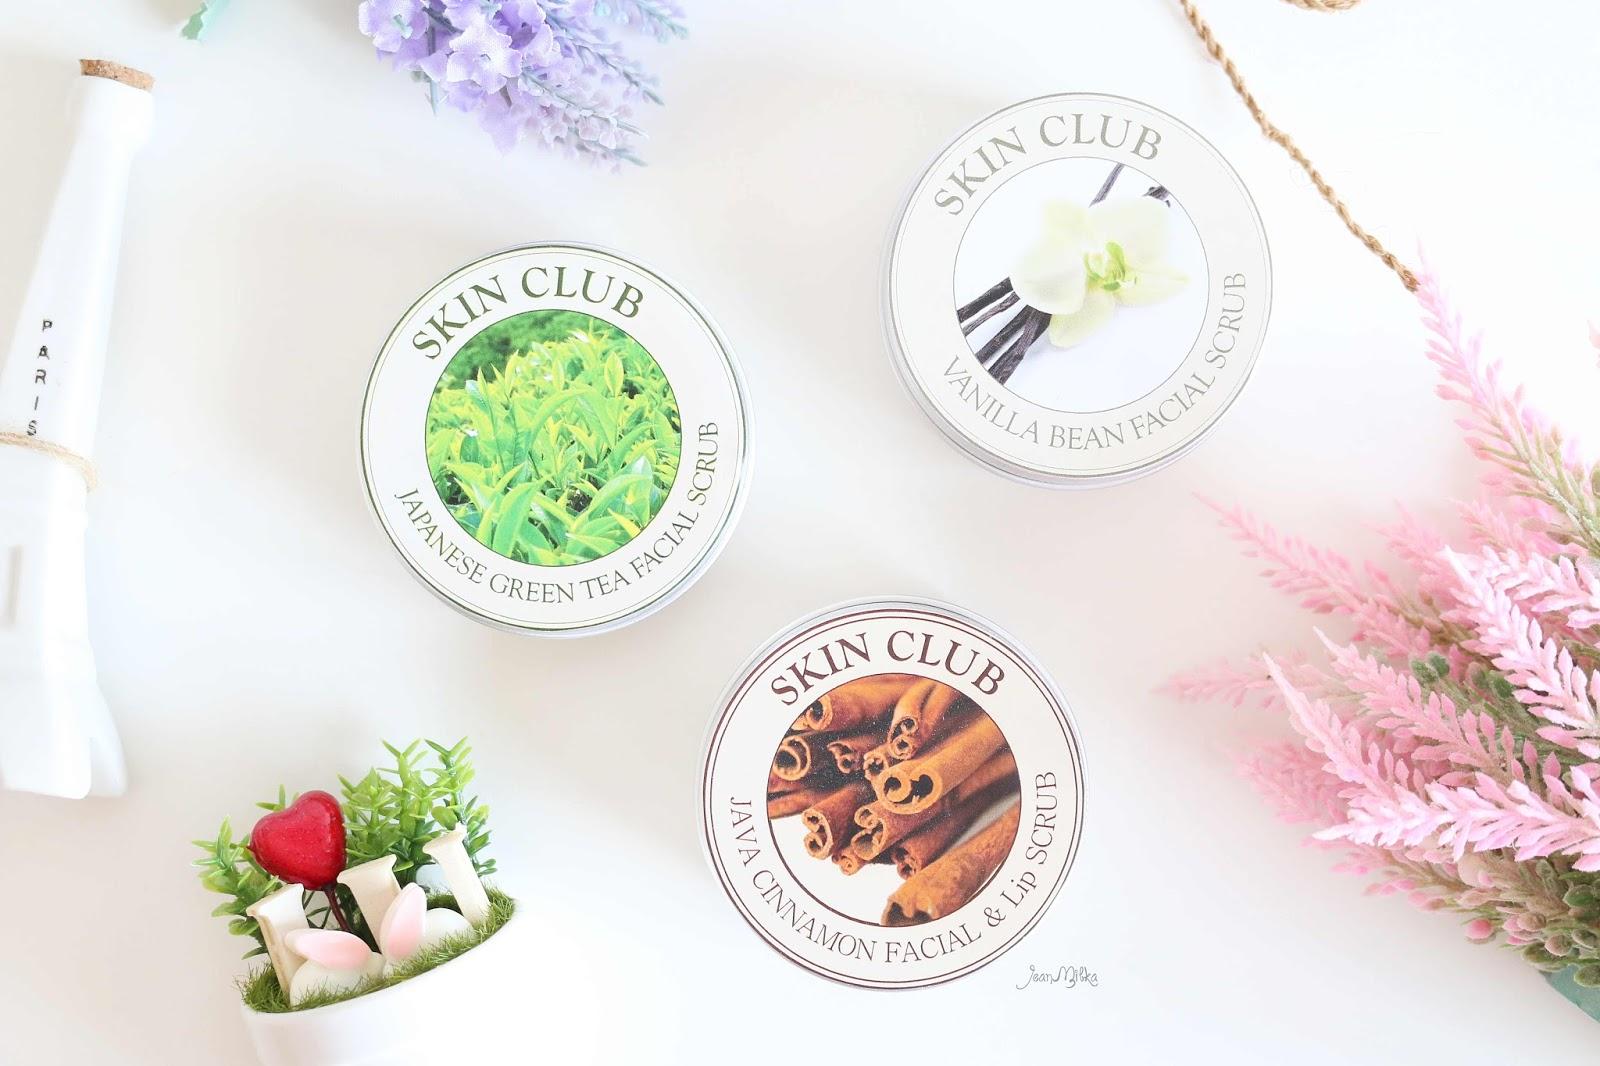 skin club, scrub, facial scrub, lip scrub, homemade, homemade scrub, review, mask republic, skin care, beauty, natural mask